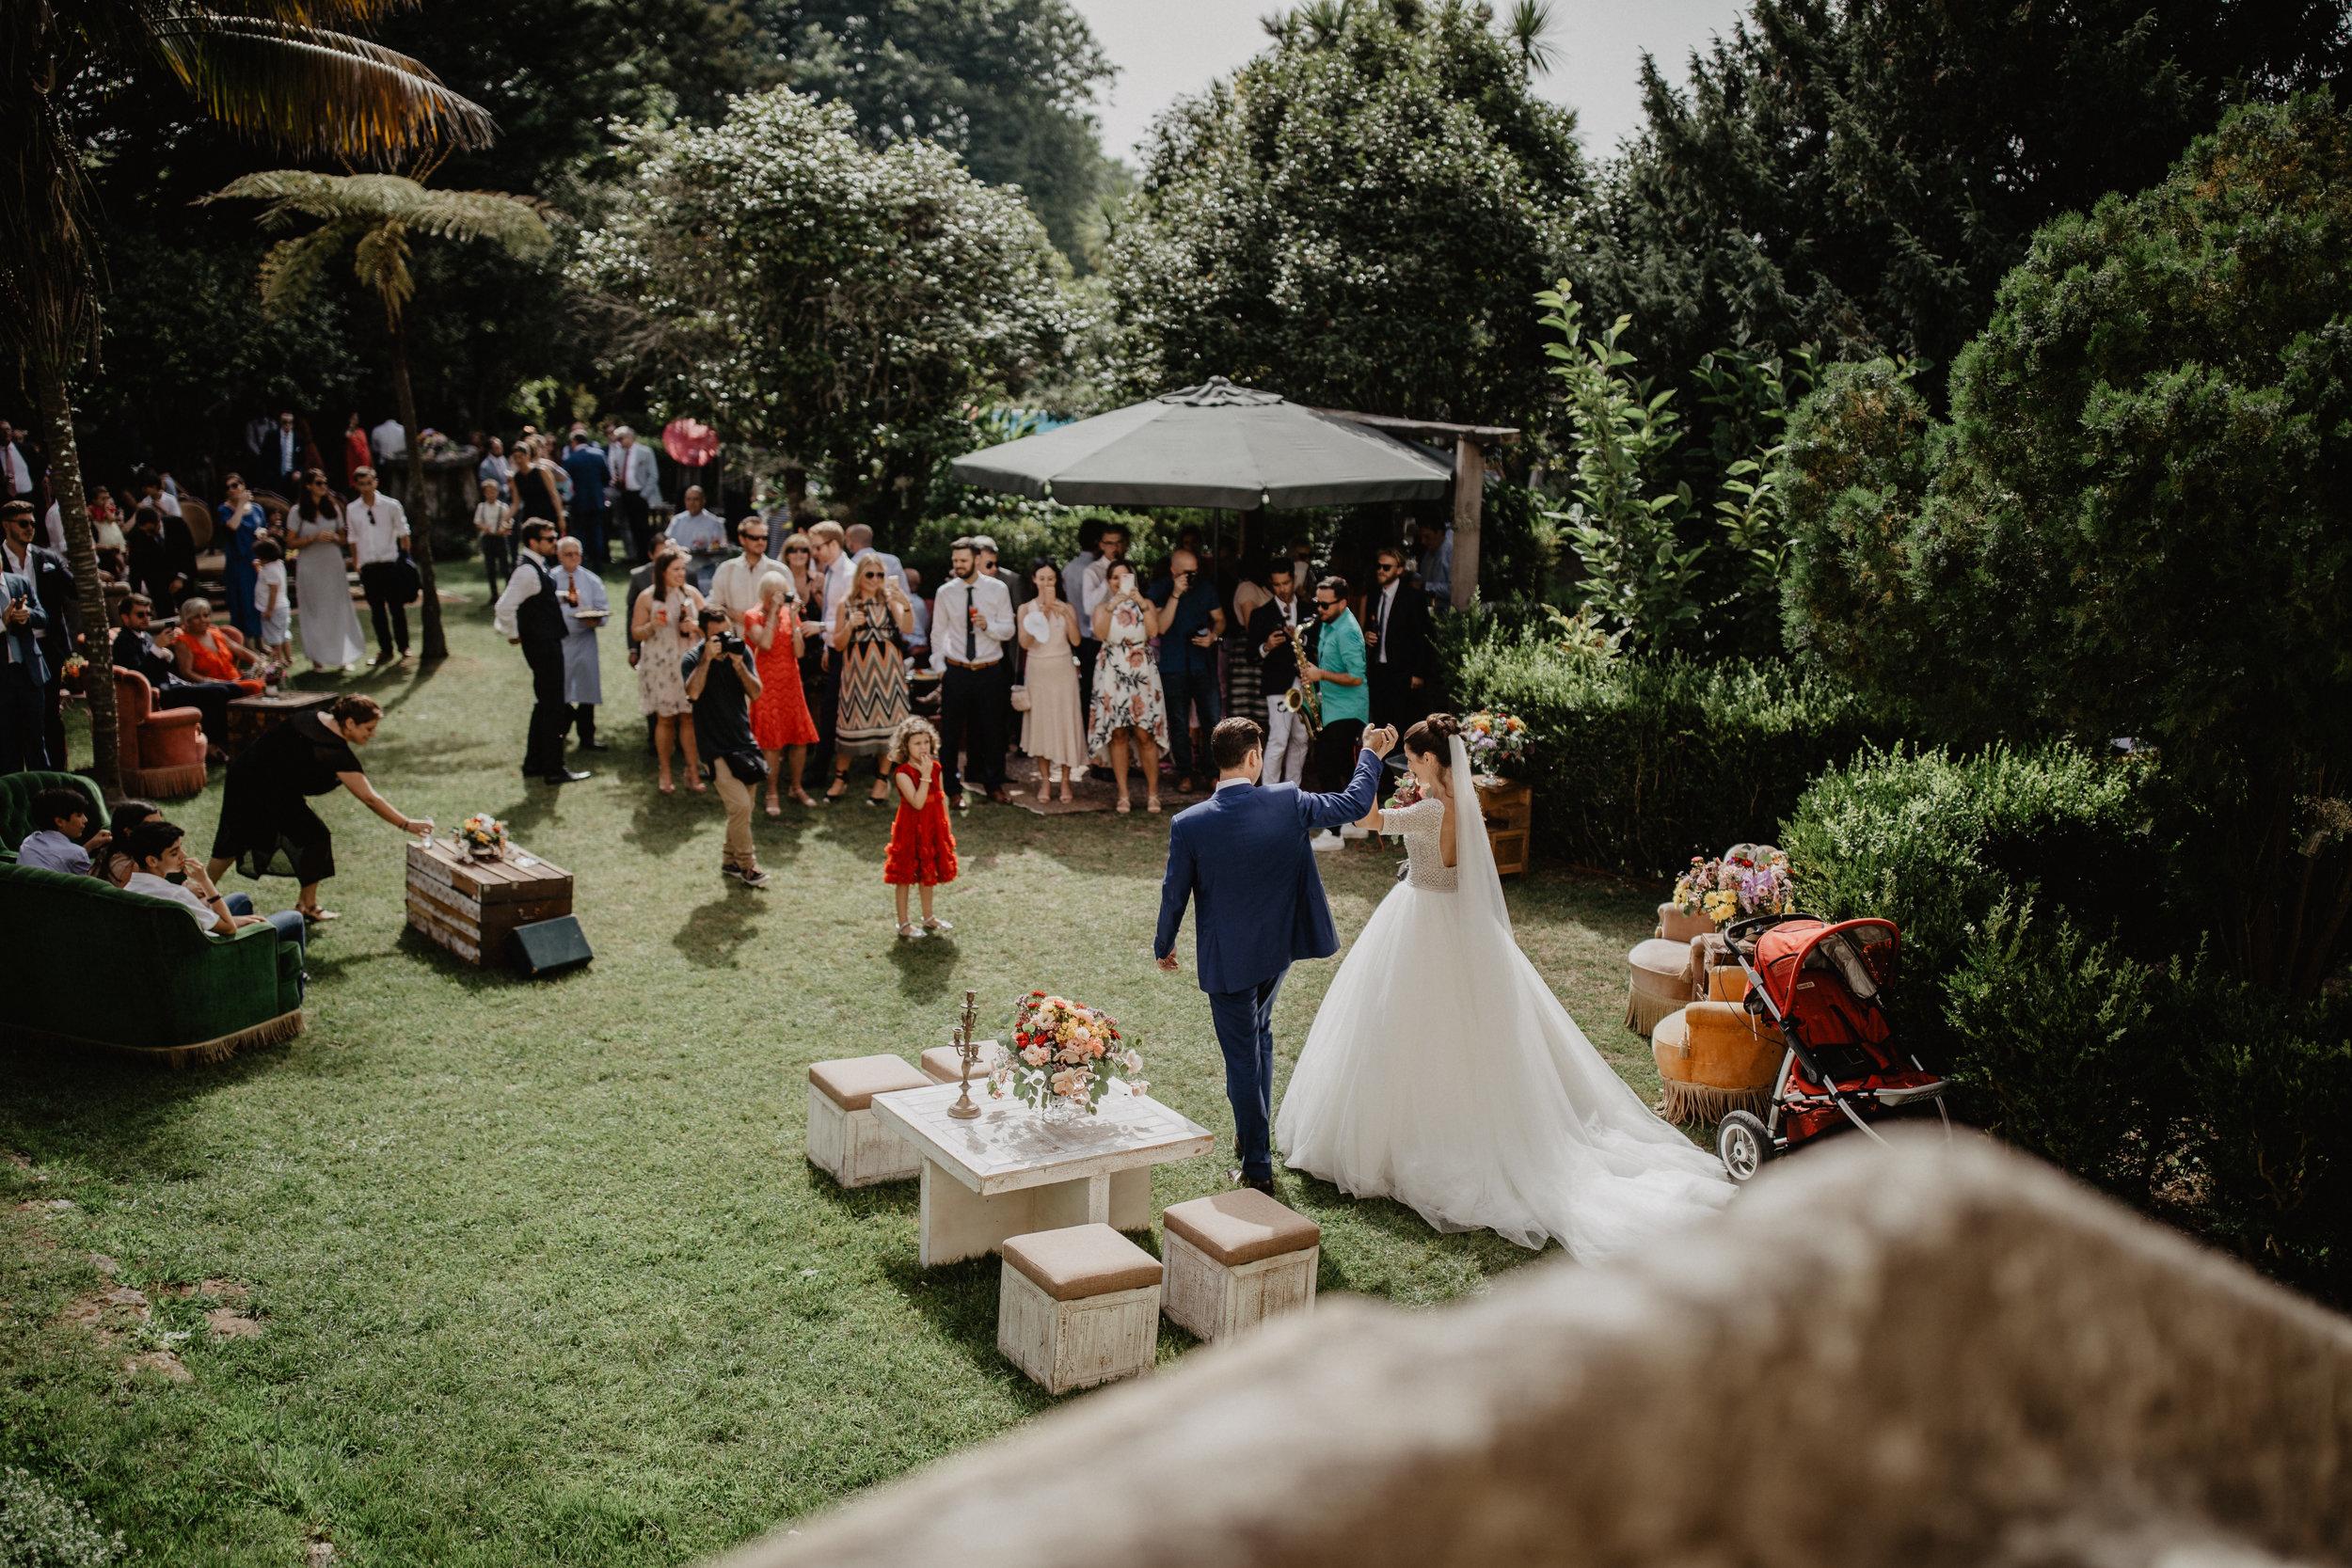 Lapela-photography-wedding-sintra-portugal-75.jpg